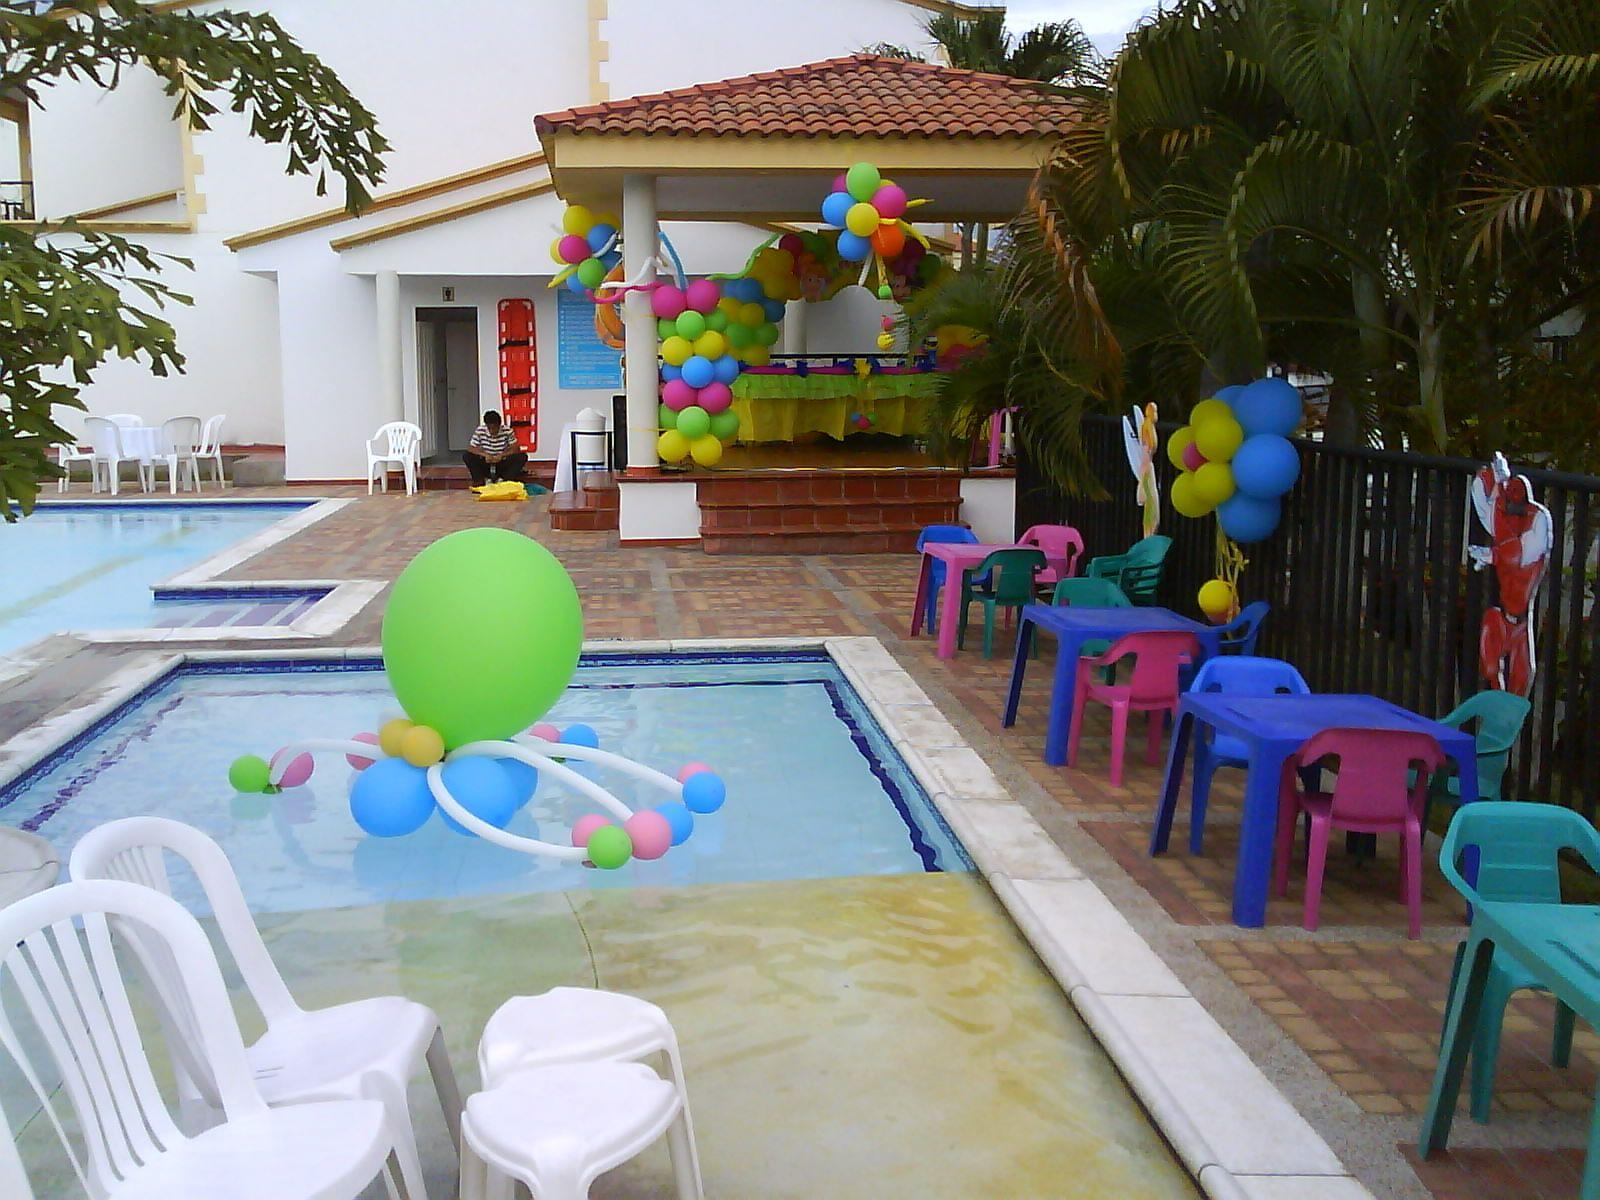 figuras de globos en piscina - Decoracion De Piscinas